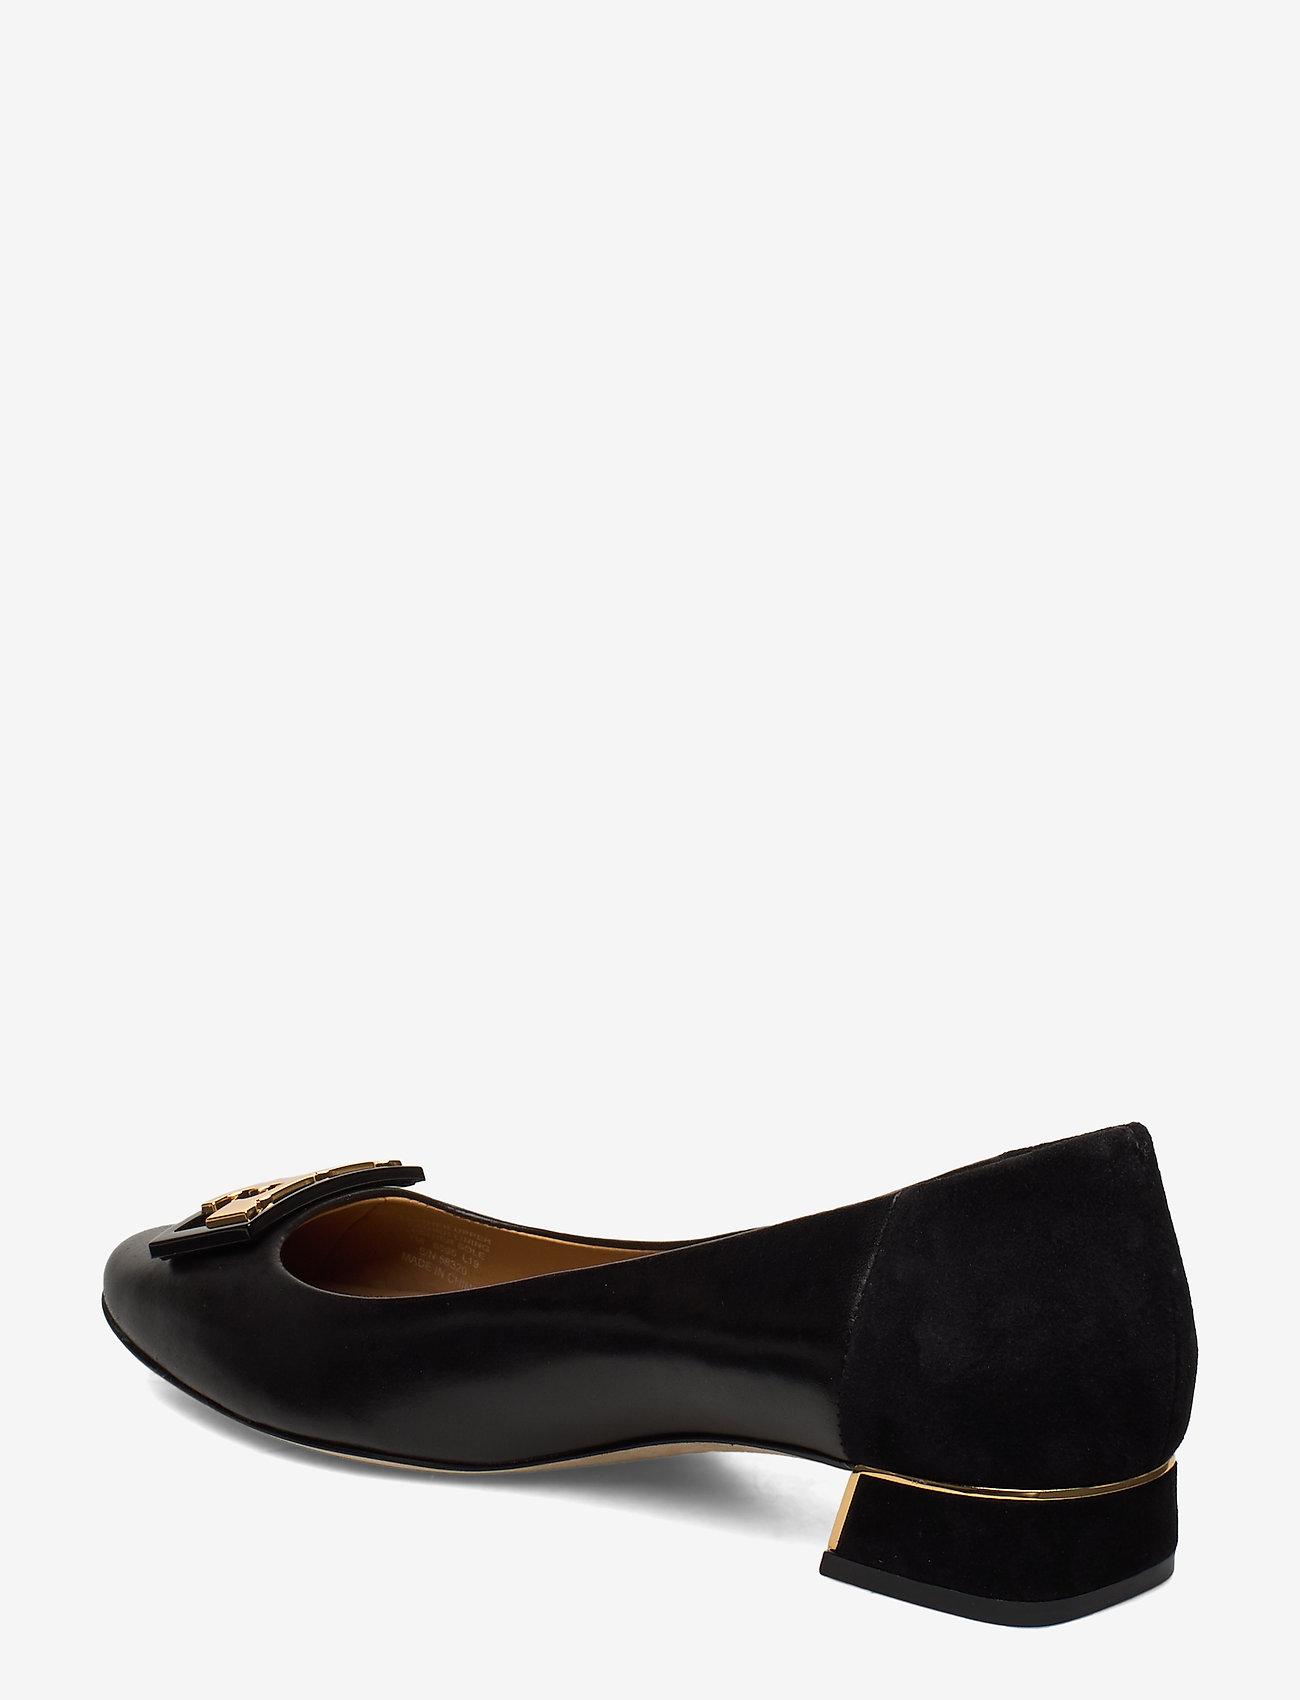 Gigi 20mm Round Toe Flat (Perfect Black / Perfect Black) - Tory Burch